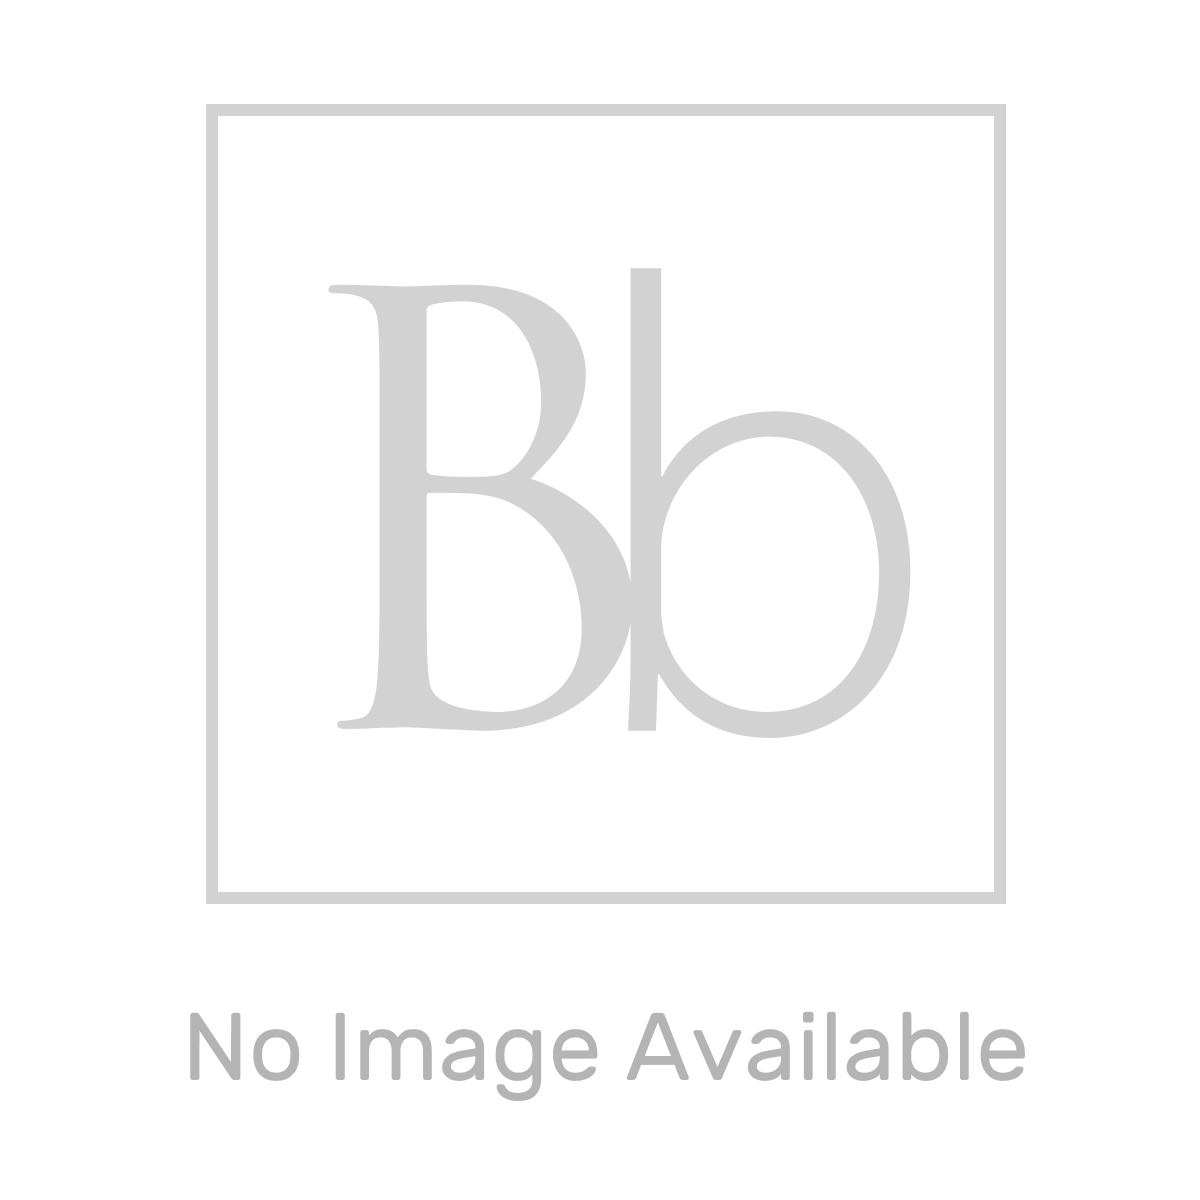 RAK Surface Mid Grey Rustic Tile 600 x 600mm